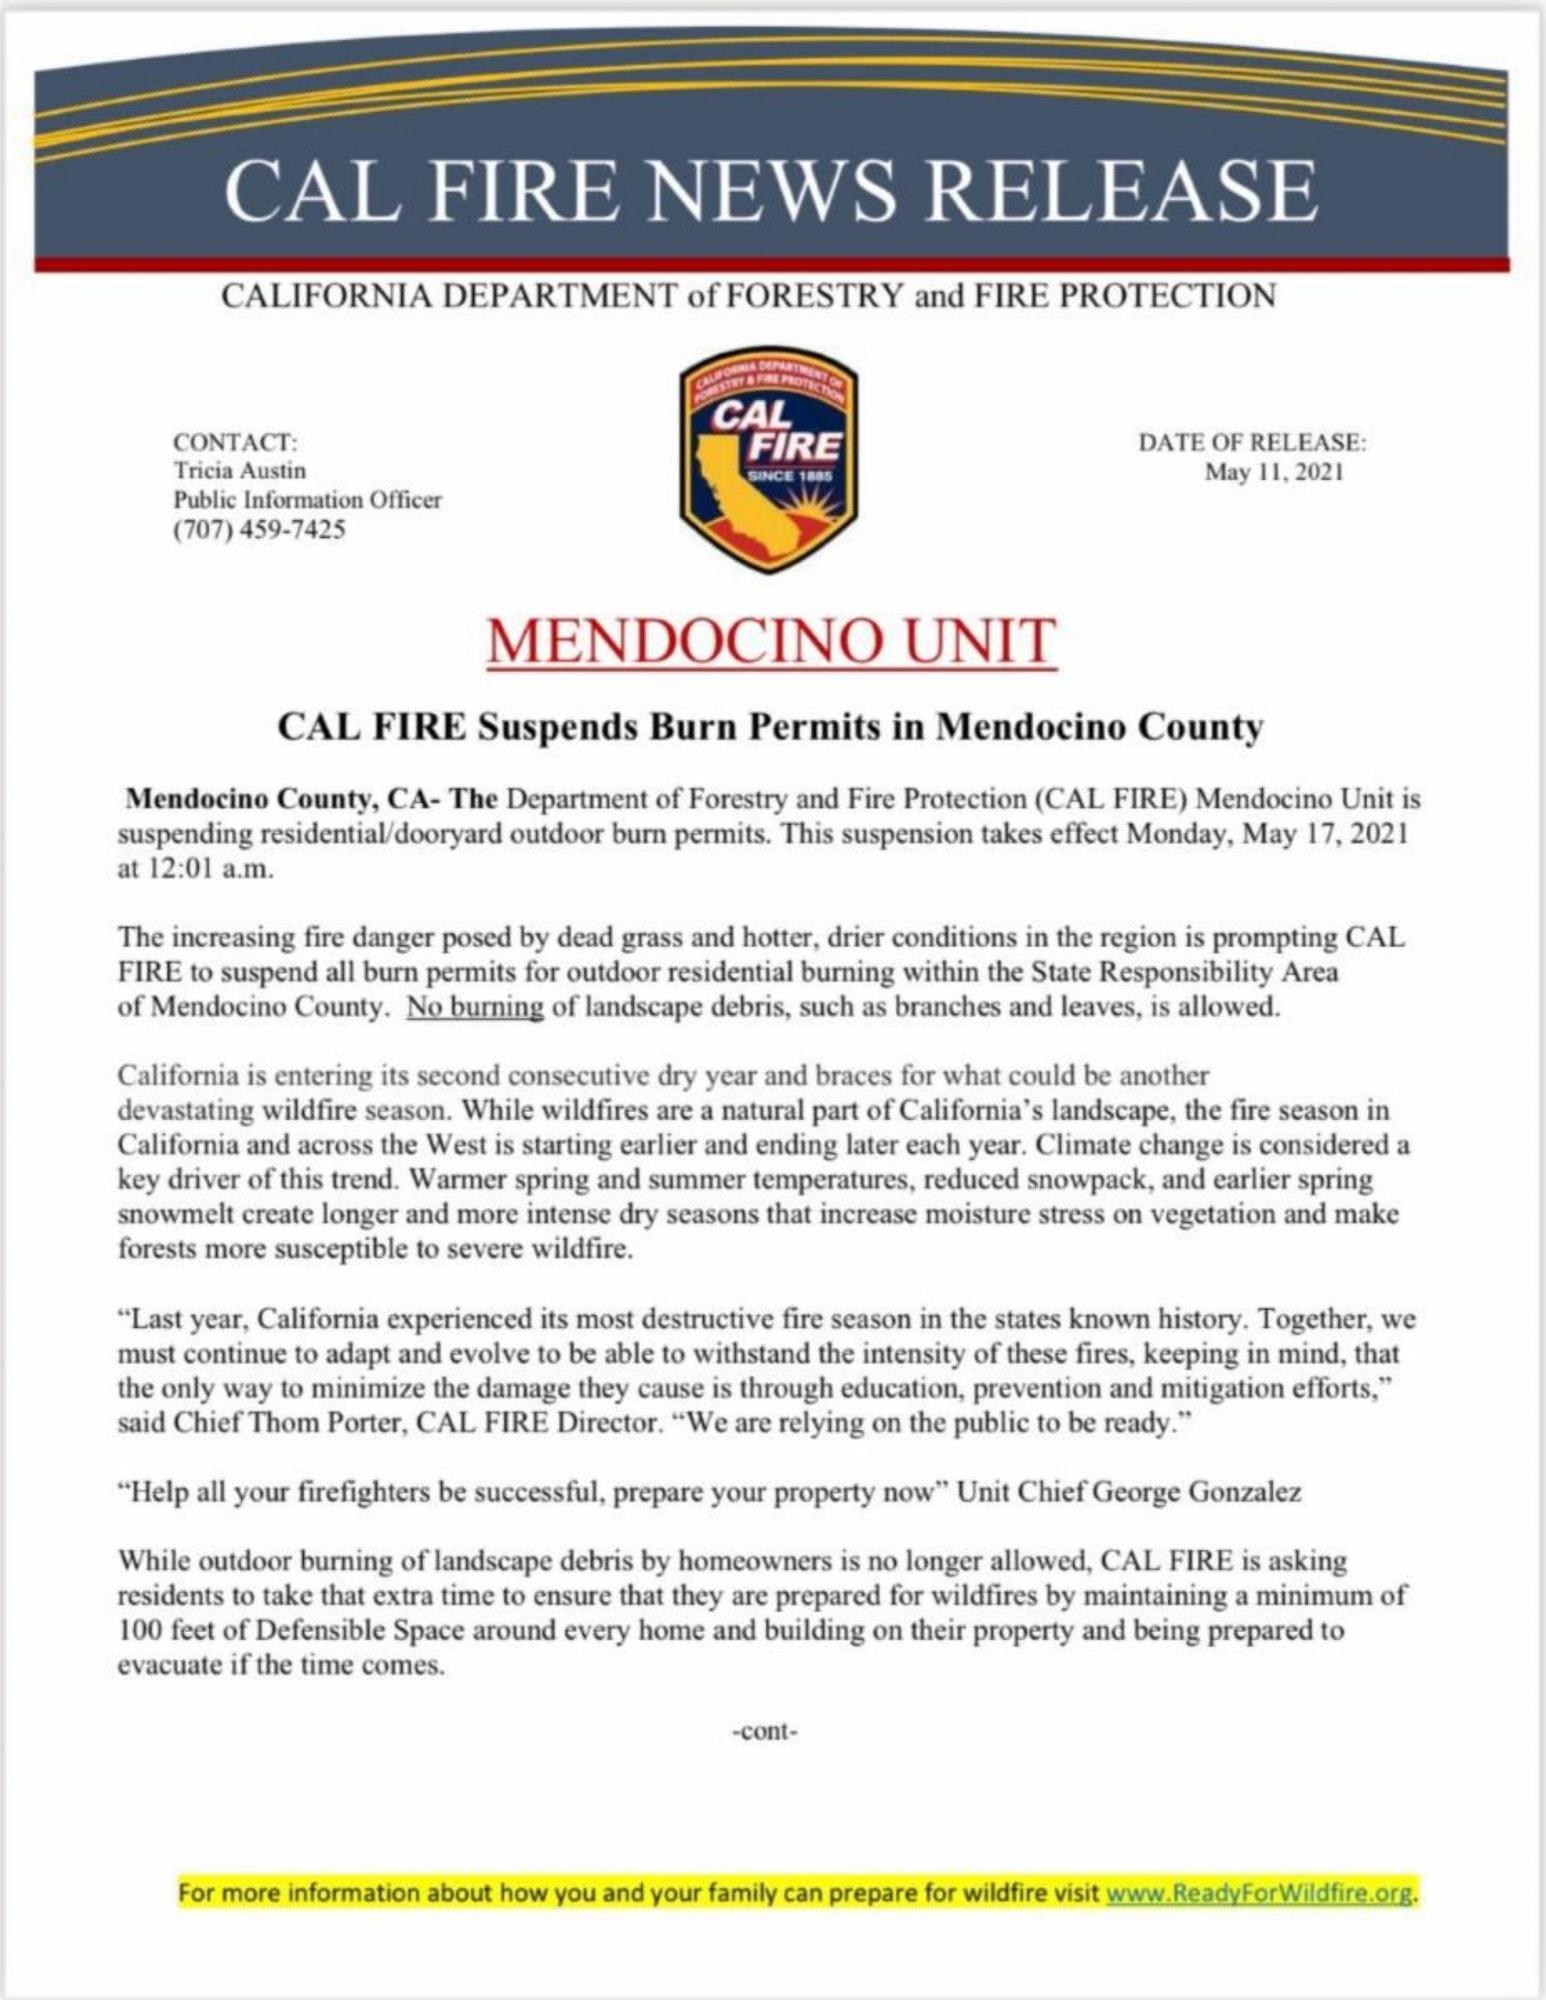 CalFire News Release regarding Burn Permit Suspension